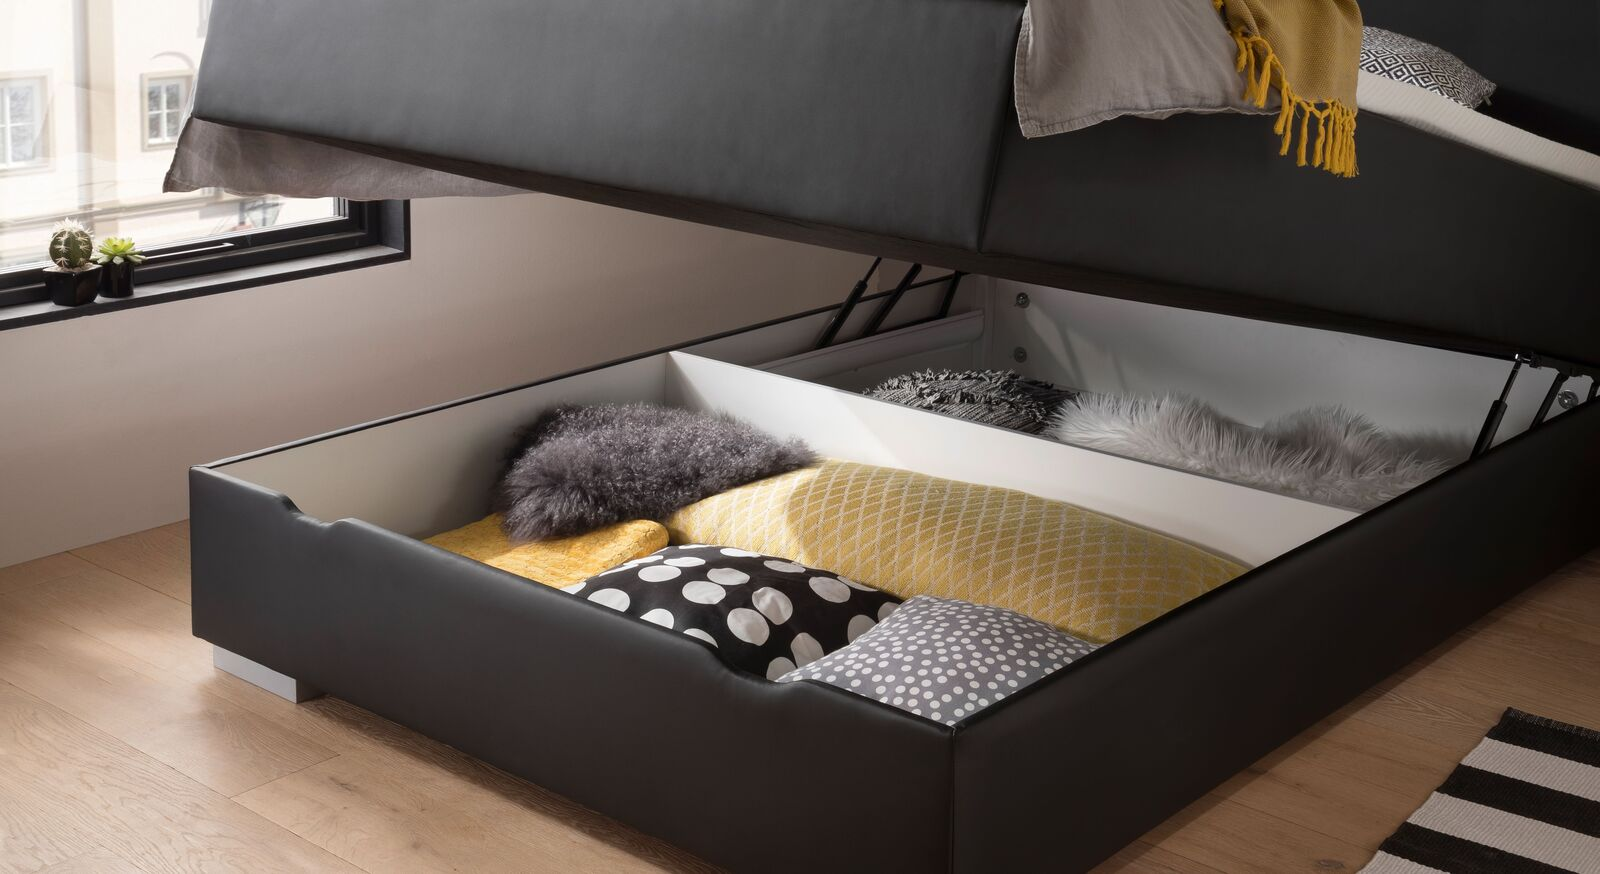 Bettkasten-Boxspringbett Merwin mit geräumigen Bettkasten